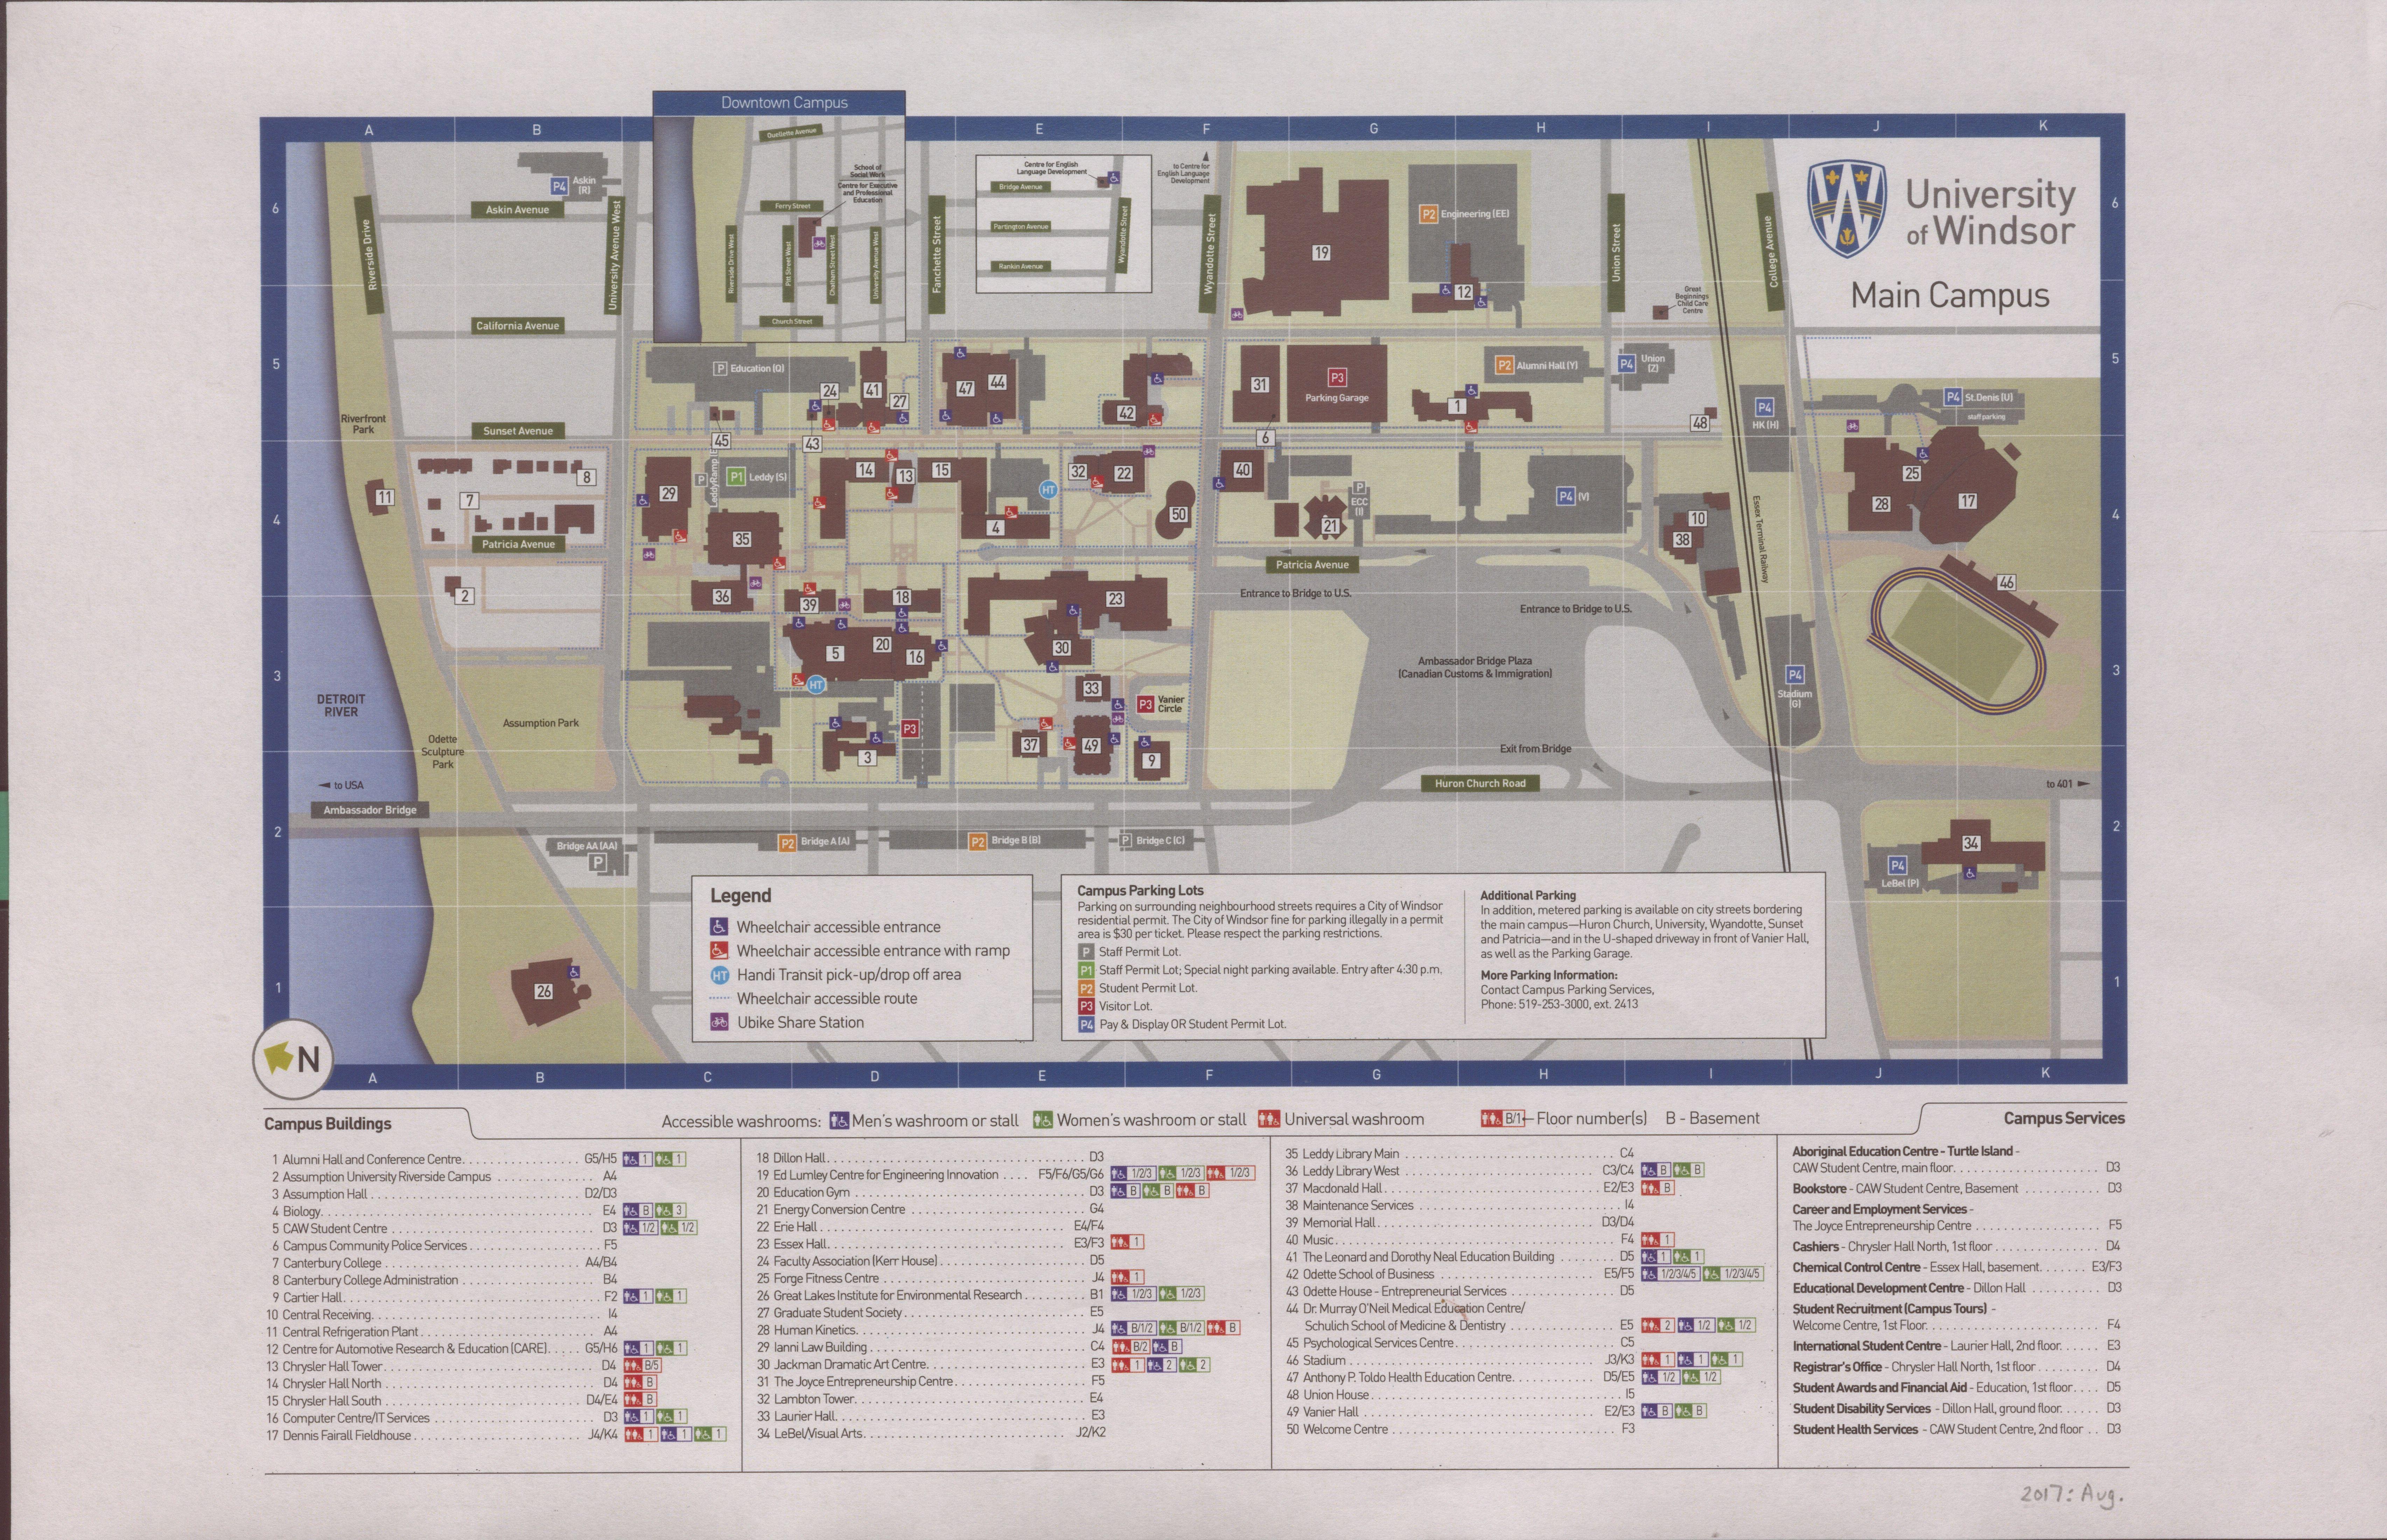 university of windsor campus map University Of Windsor Campus Map 2017 Southwestern Ontario